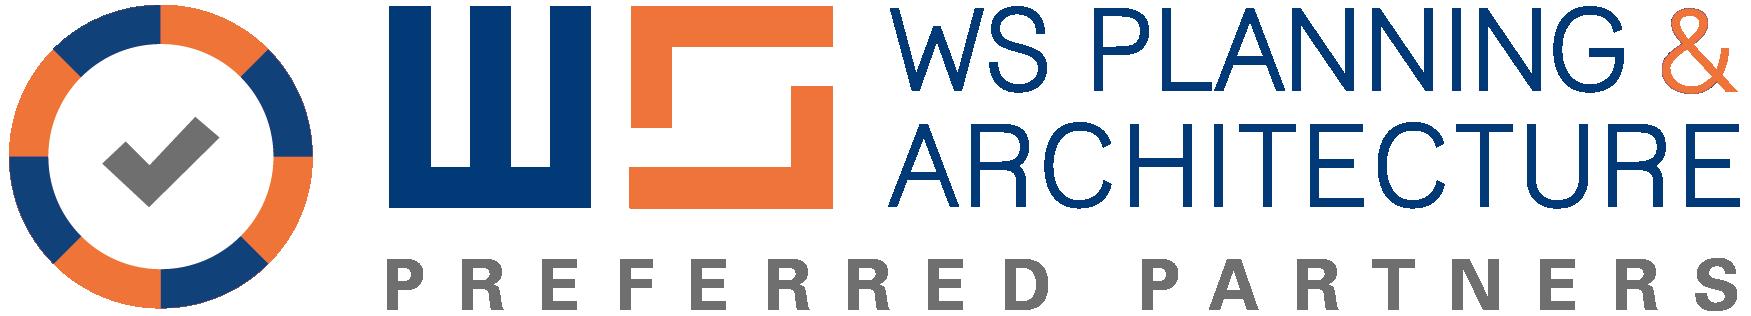 WSPA-PP-logo2018.png